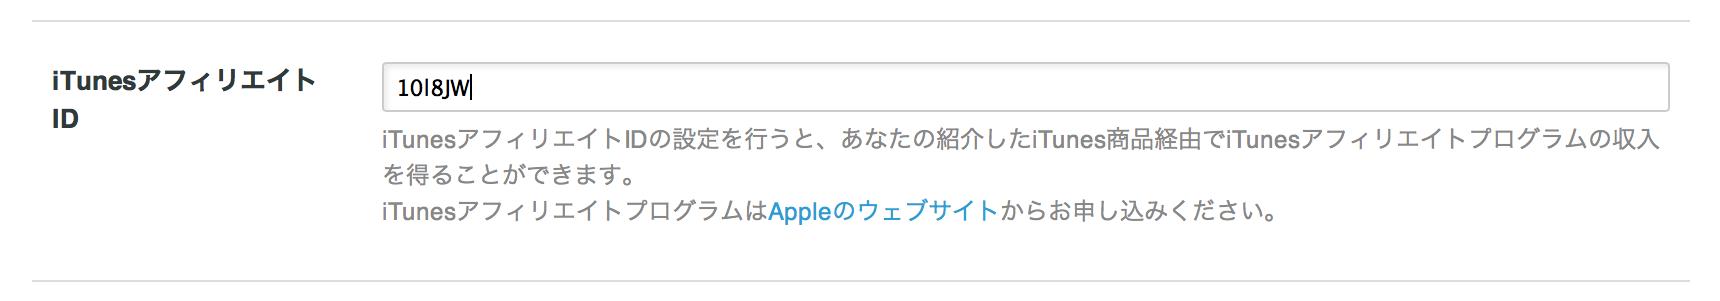 iTunesアフィリエイトIDを設定